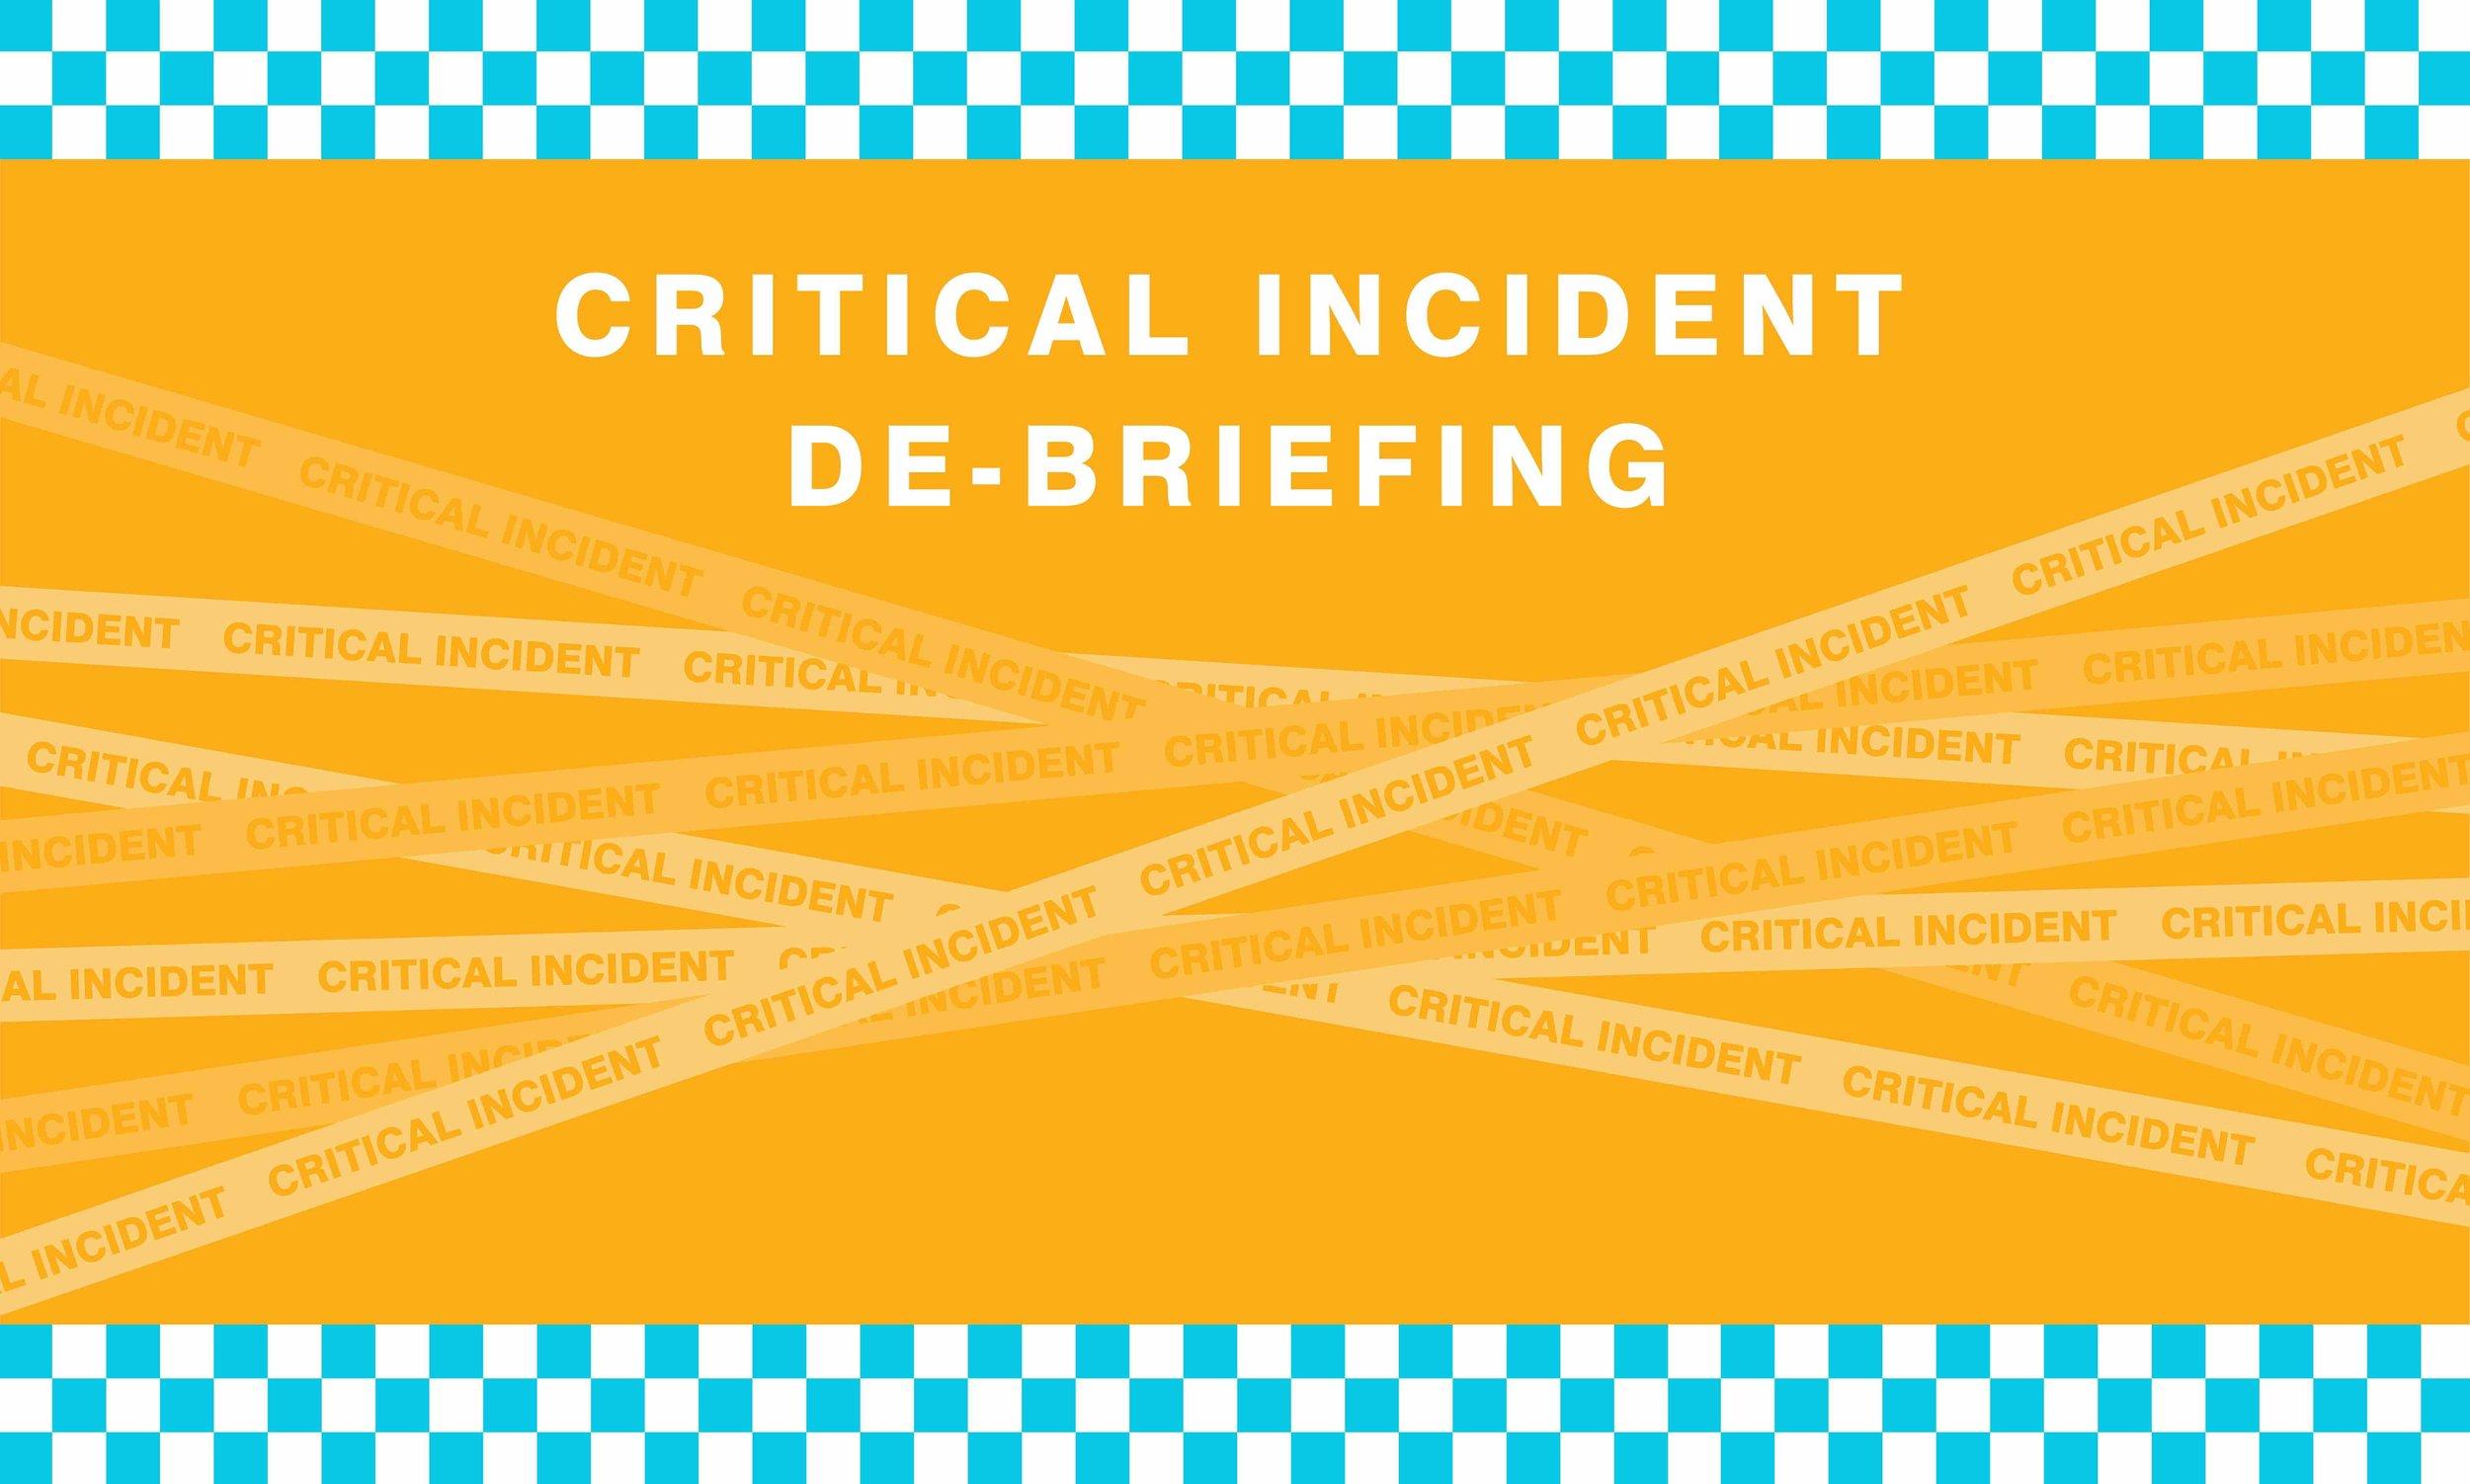 Critical Incident De-Briefing-01.jpg